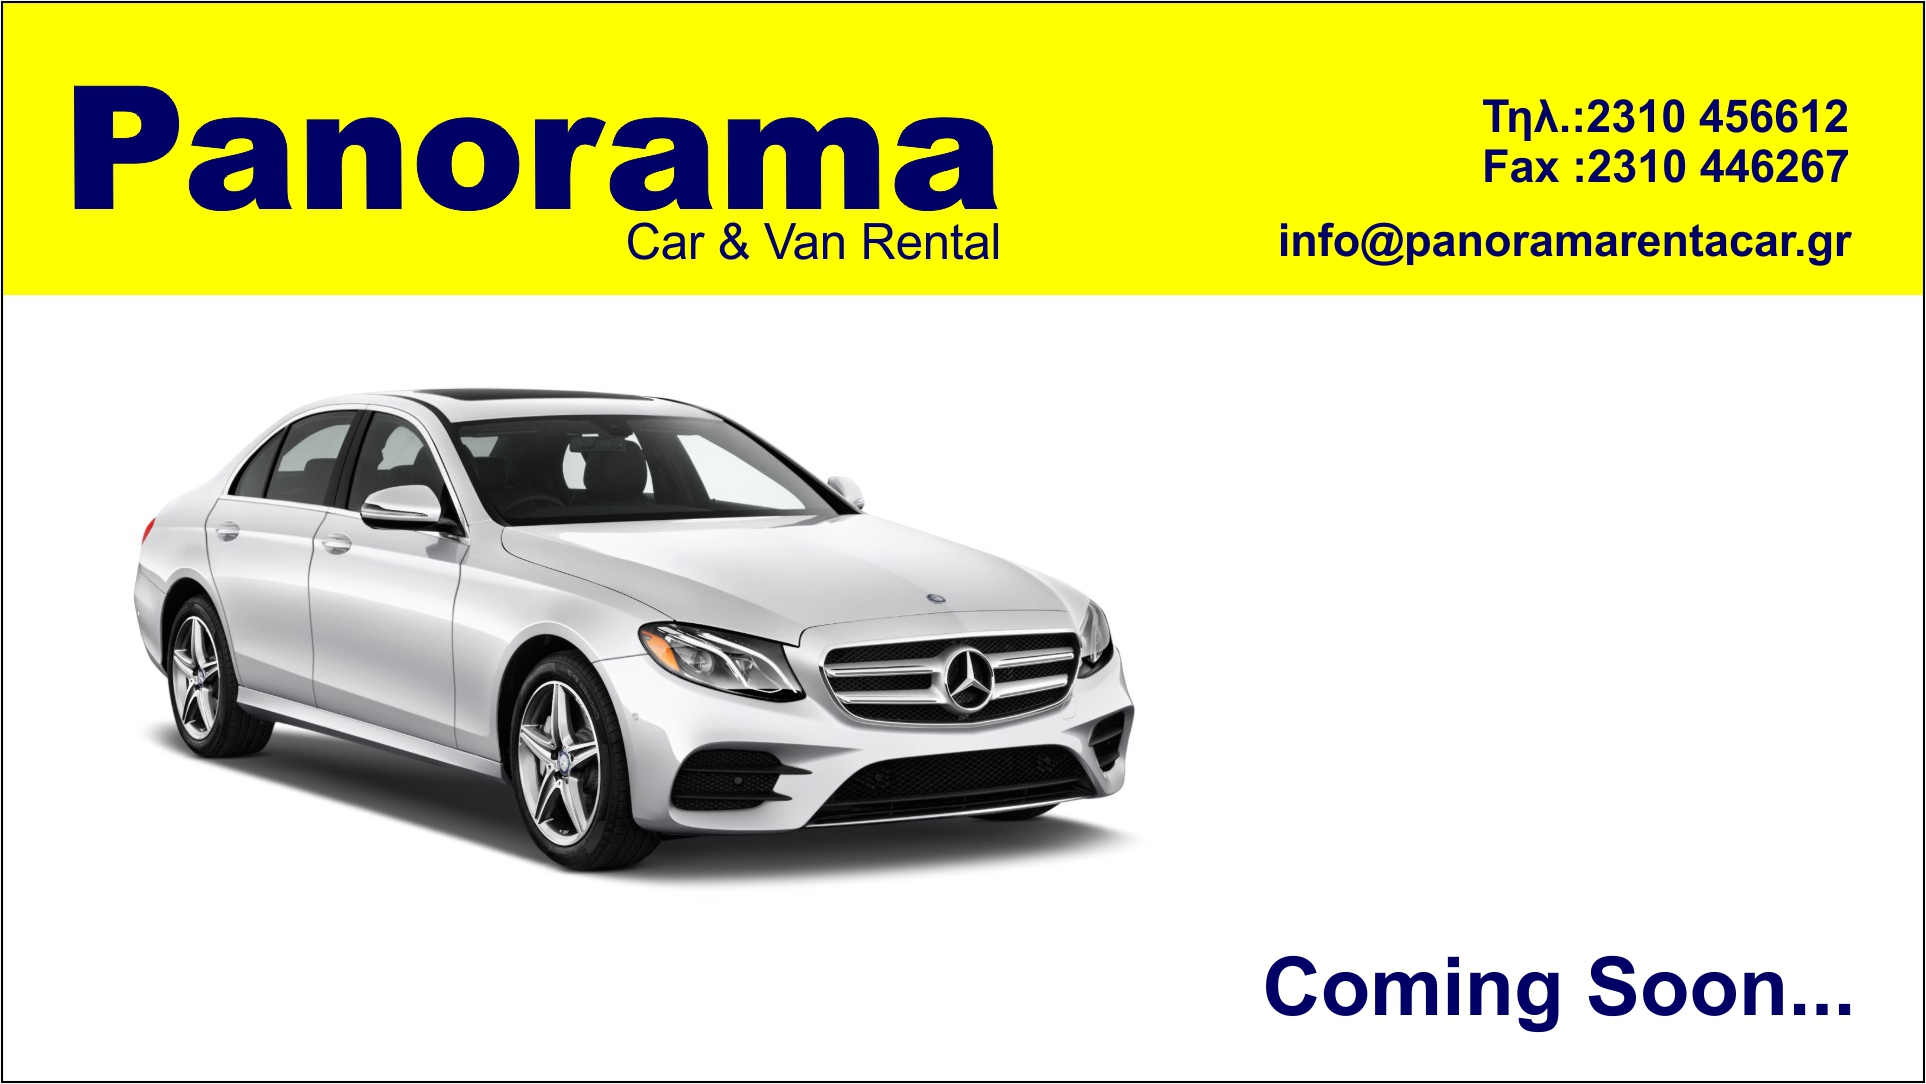 Coming-Soon-4 Panorama Rent a Car